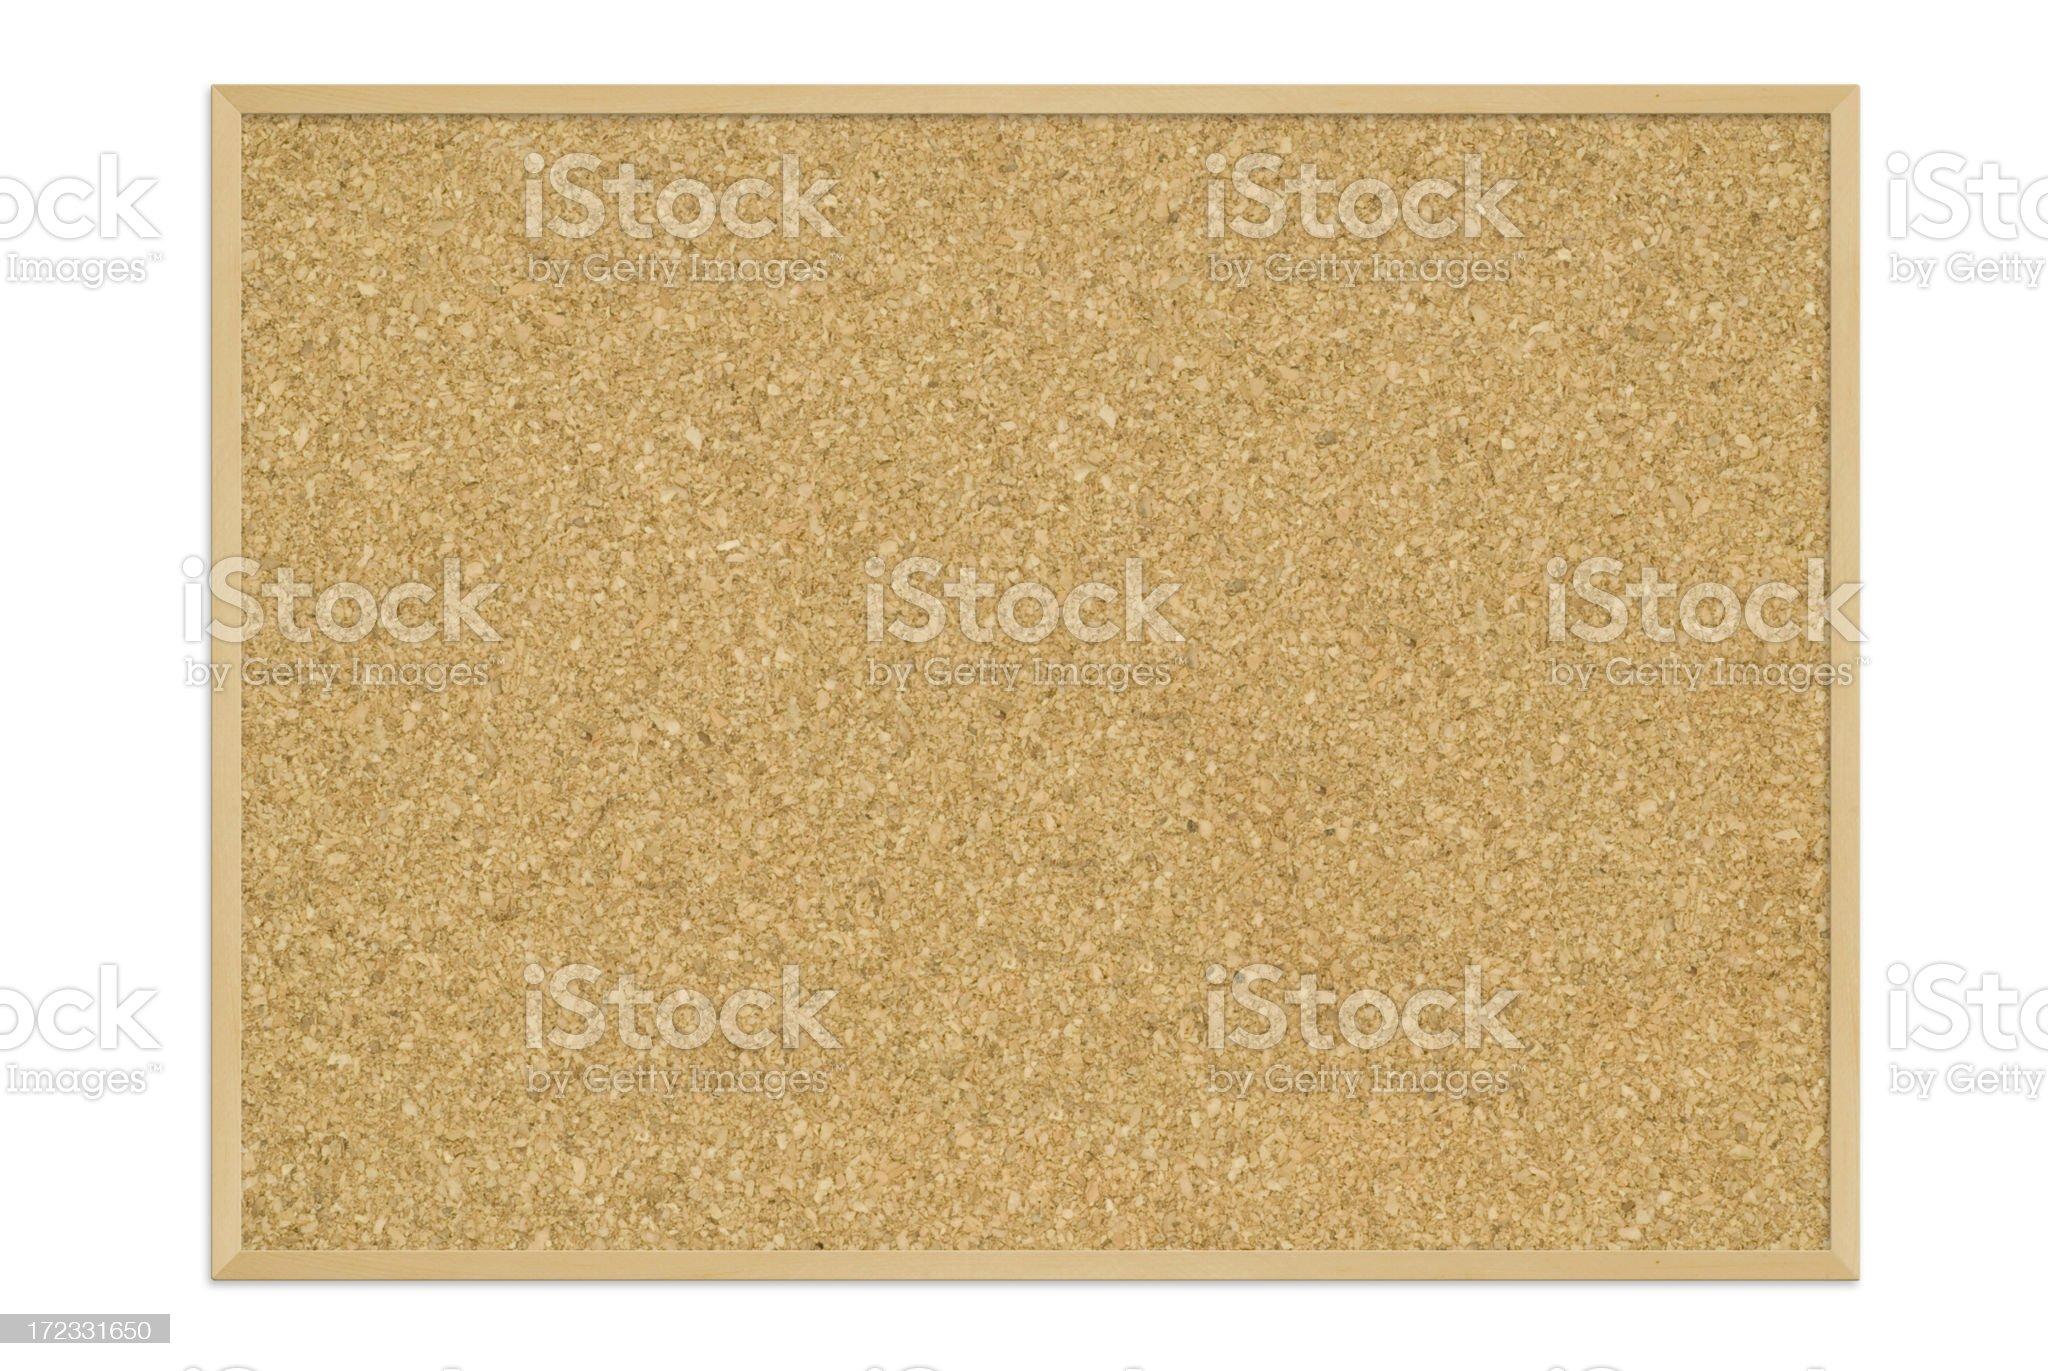 Blank framed cork board royalty-free stock photo